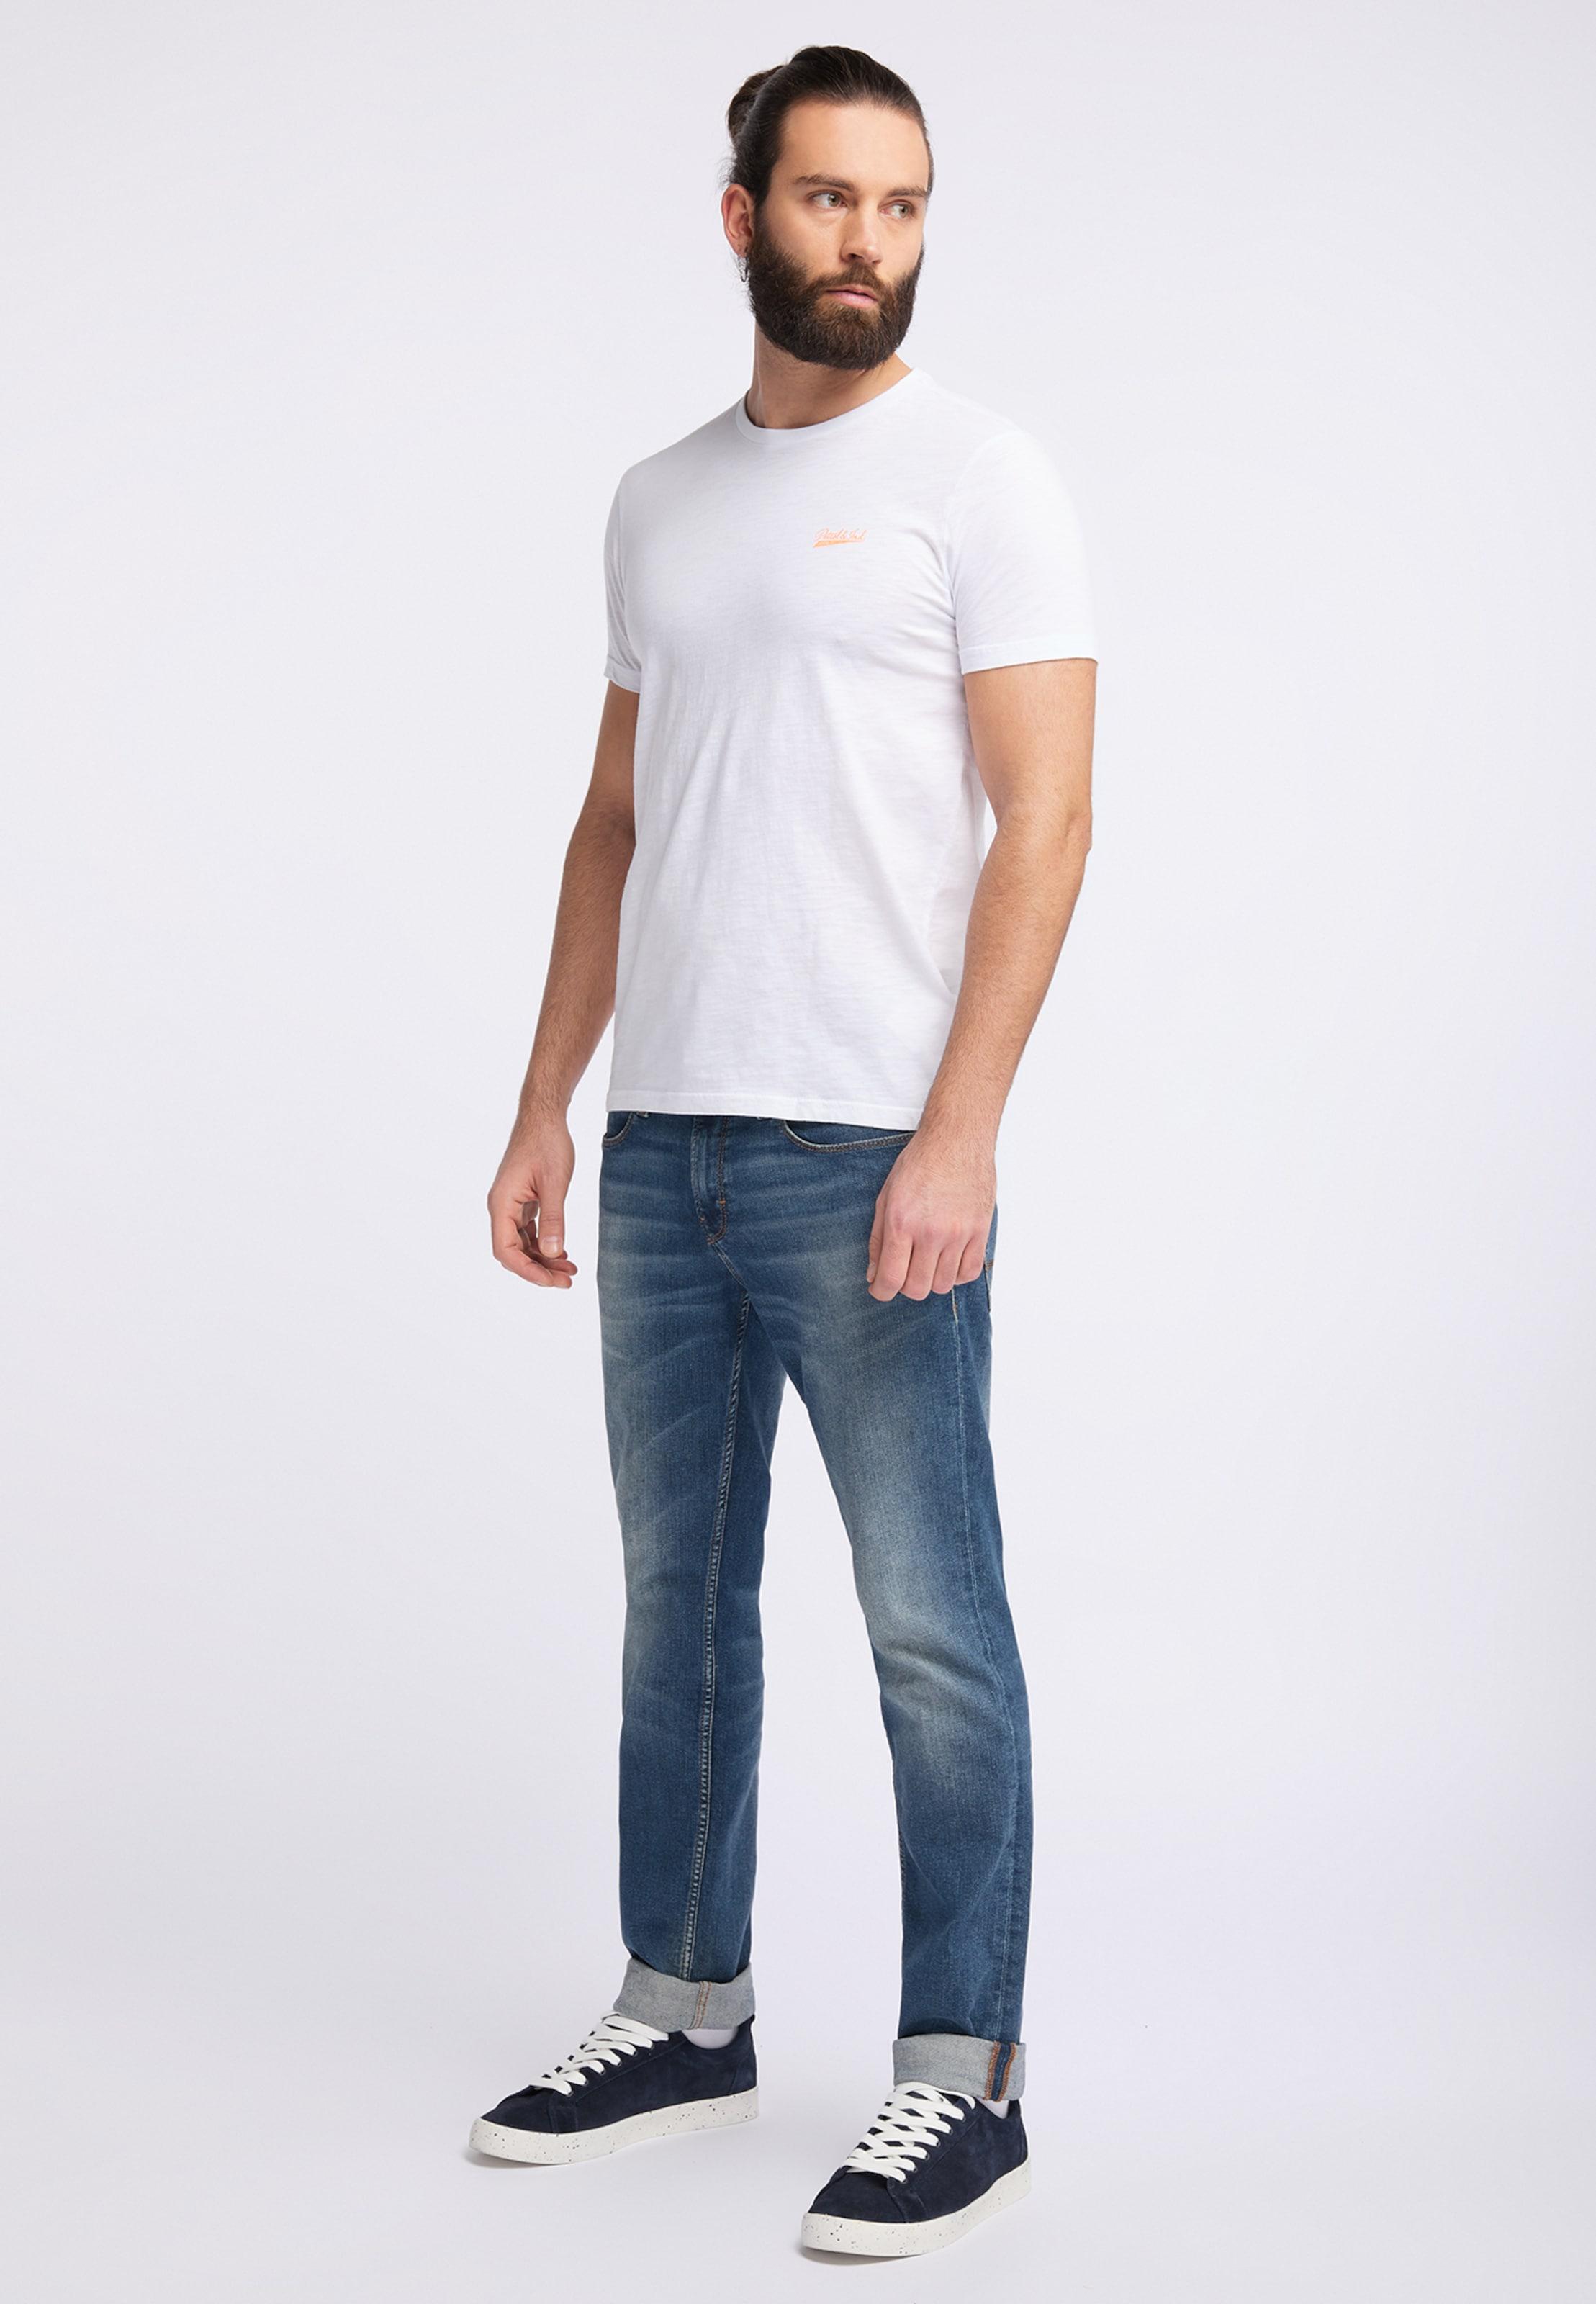 shirt In Weiß Industries T Petrol OkTPiZuX